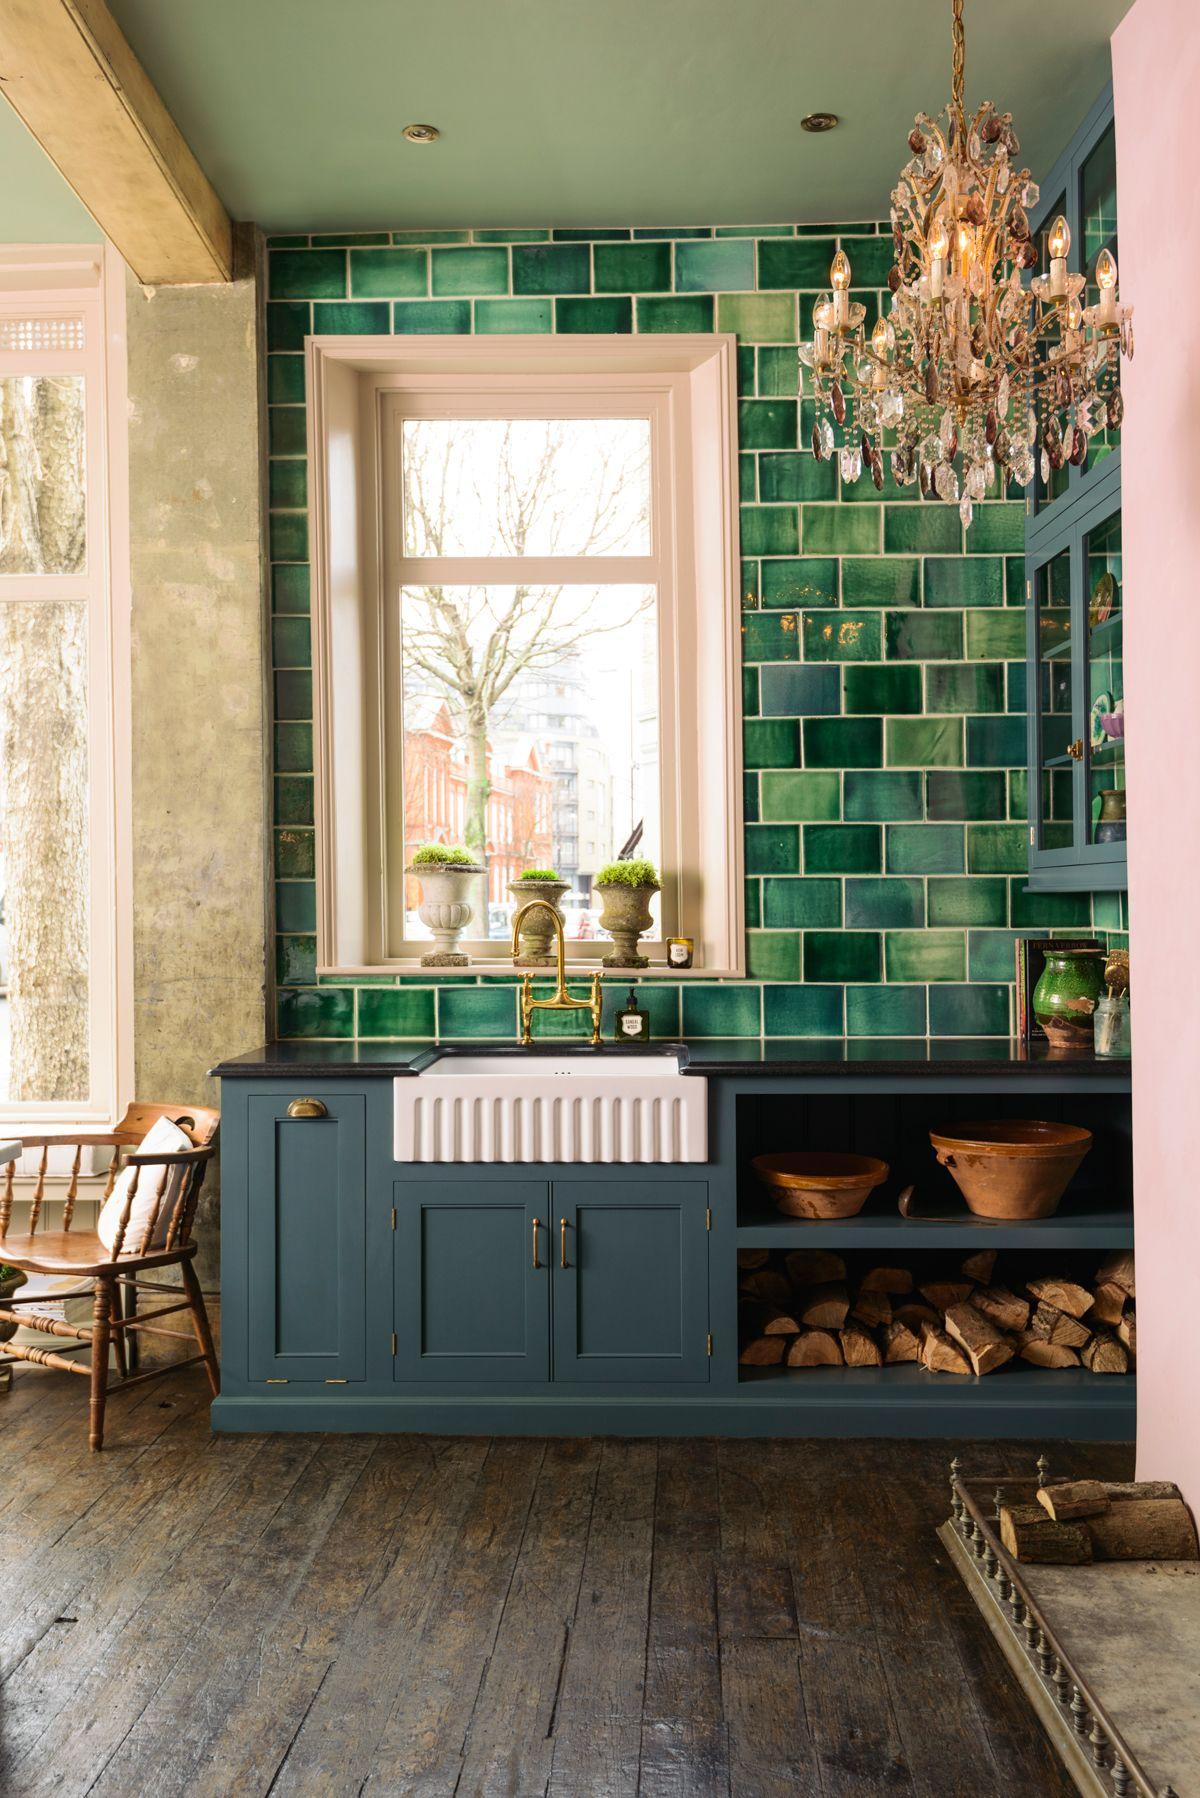 Design Led Furniture Manufacturer DeVOL Just Recently Opened Their Second  Showroom In Londonu0027s St. Johnu0027s